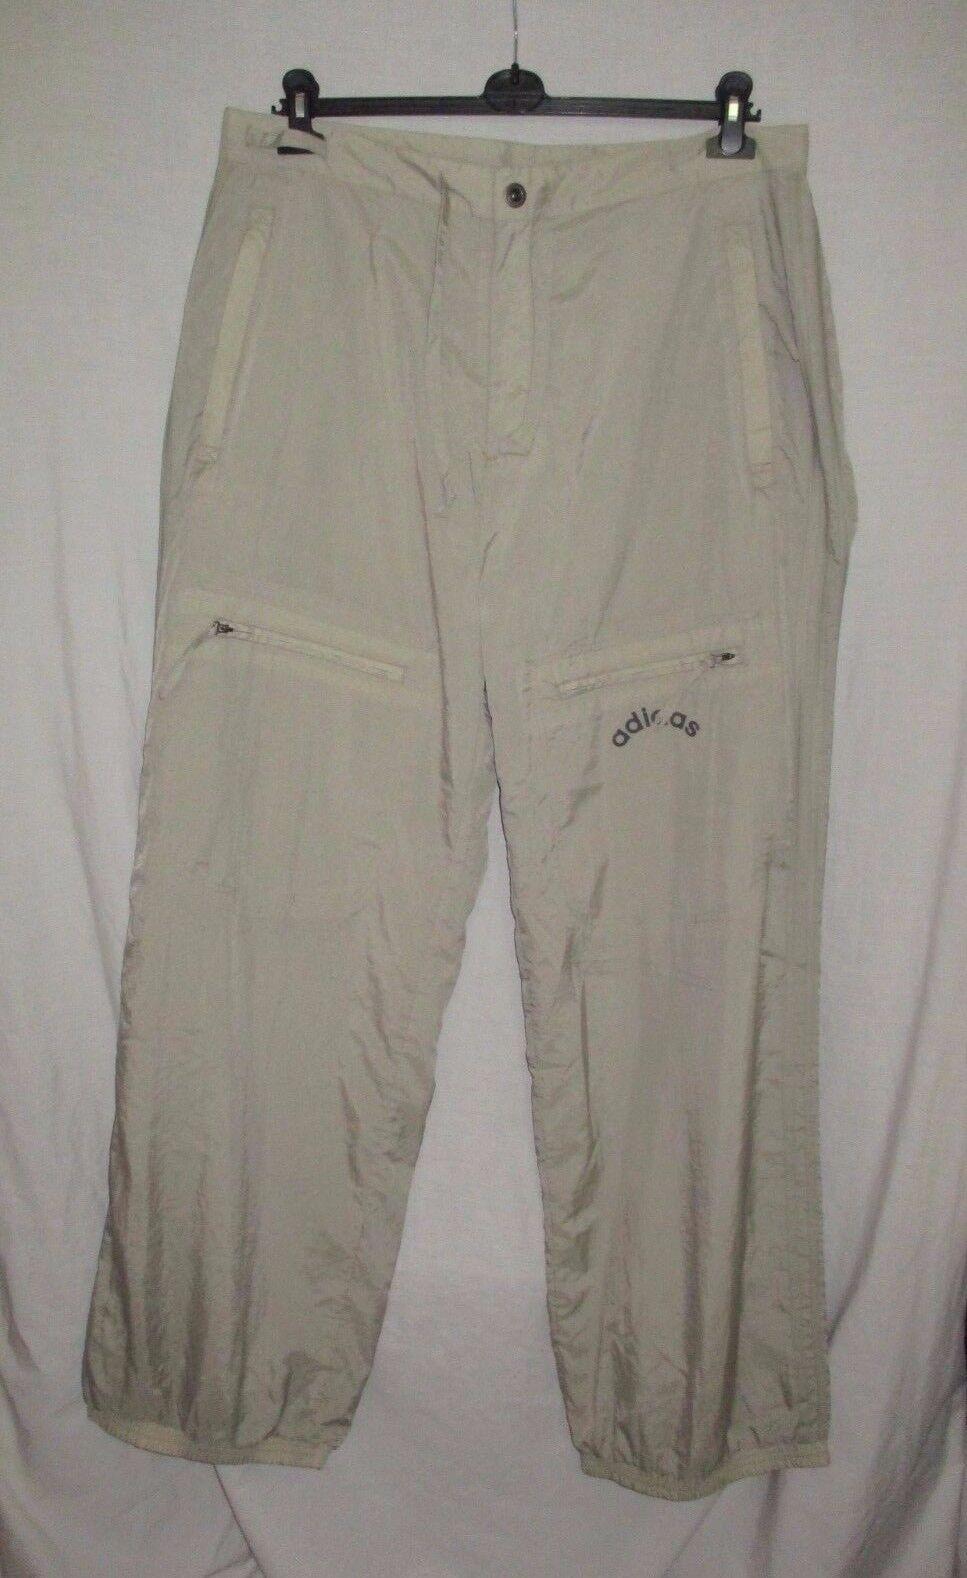 Men's ADIDAS grey sport training walking lightweight nylon pants trousers sz XL